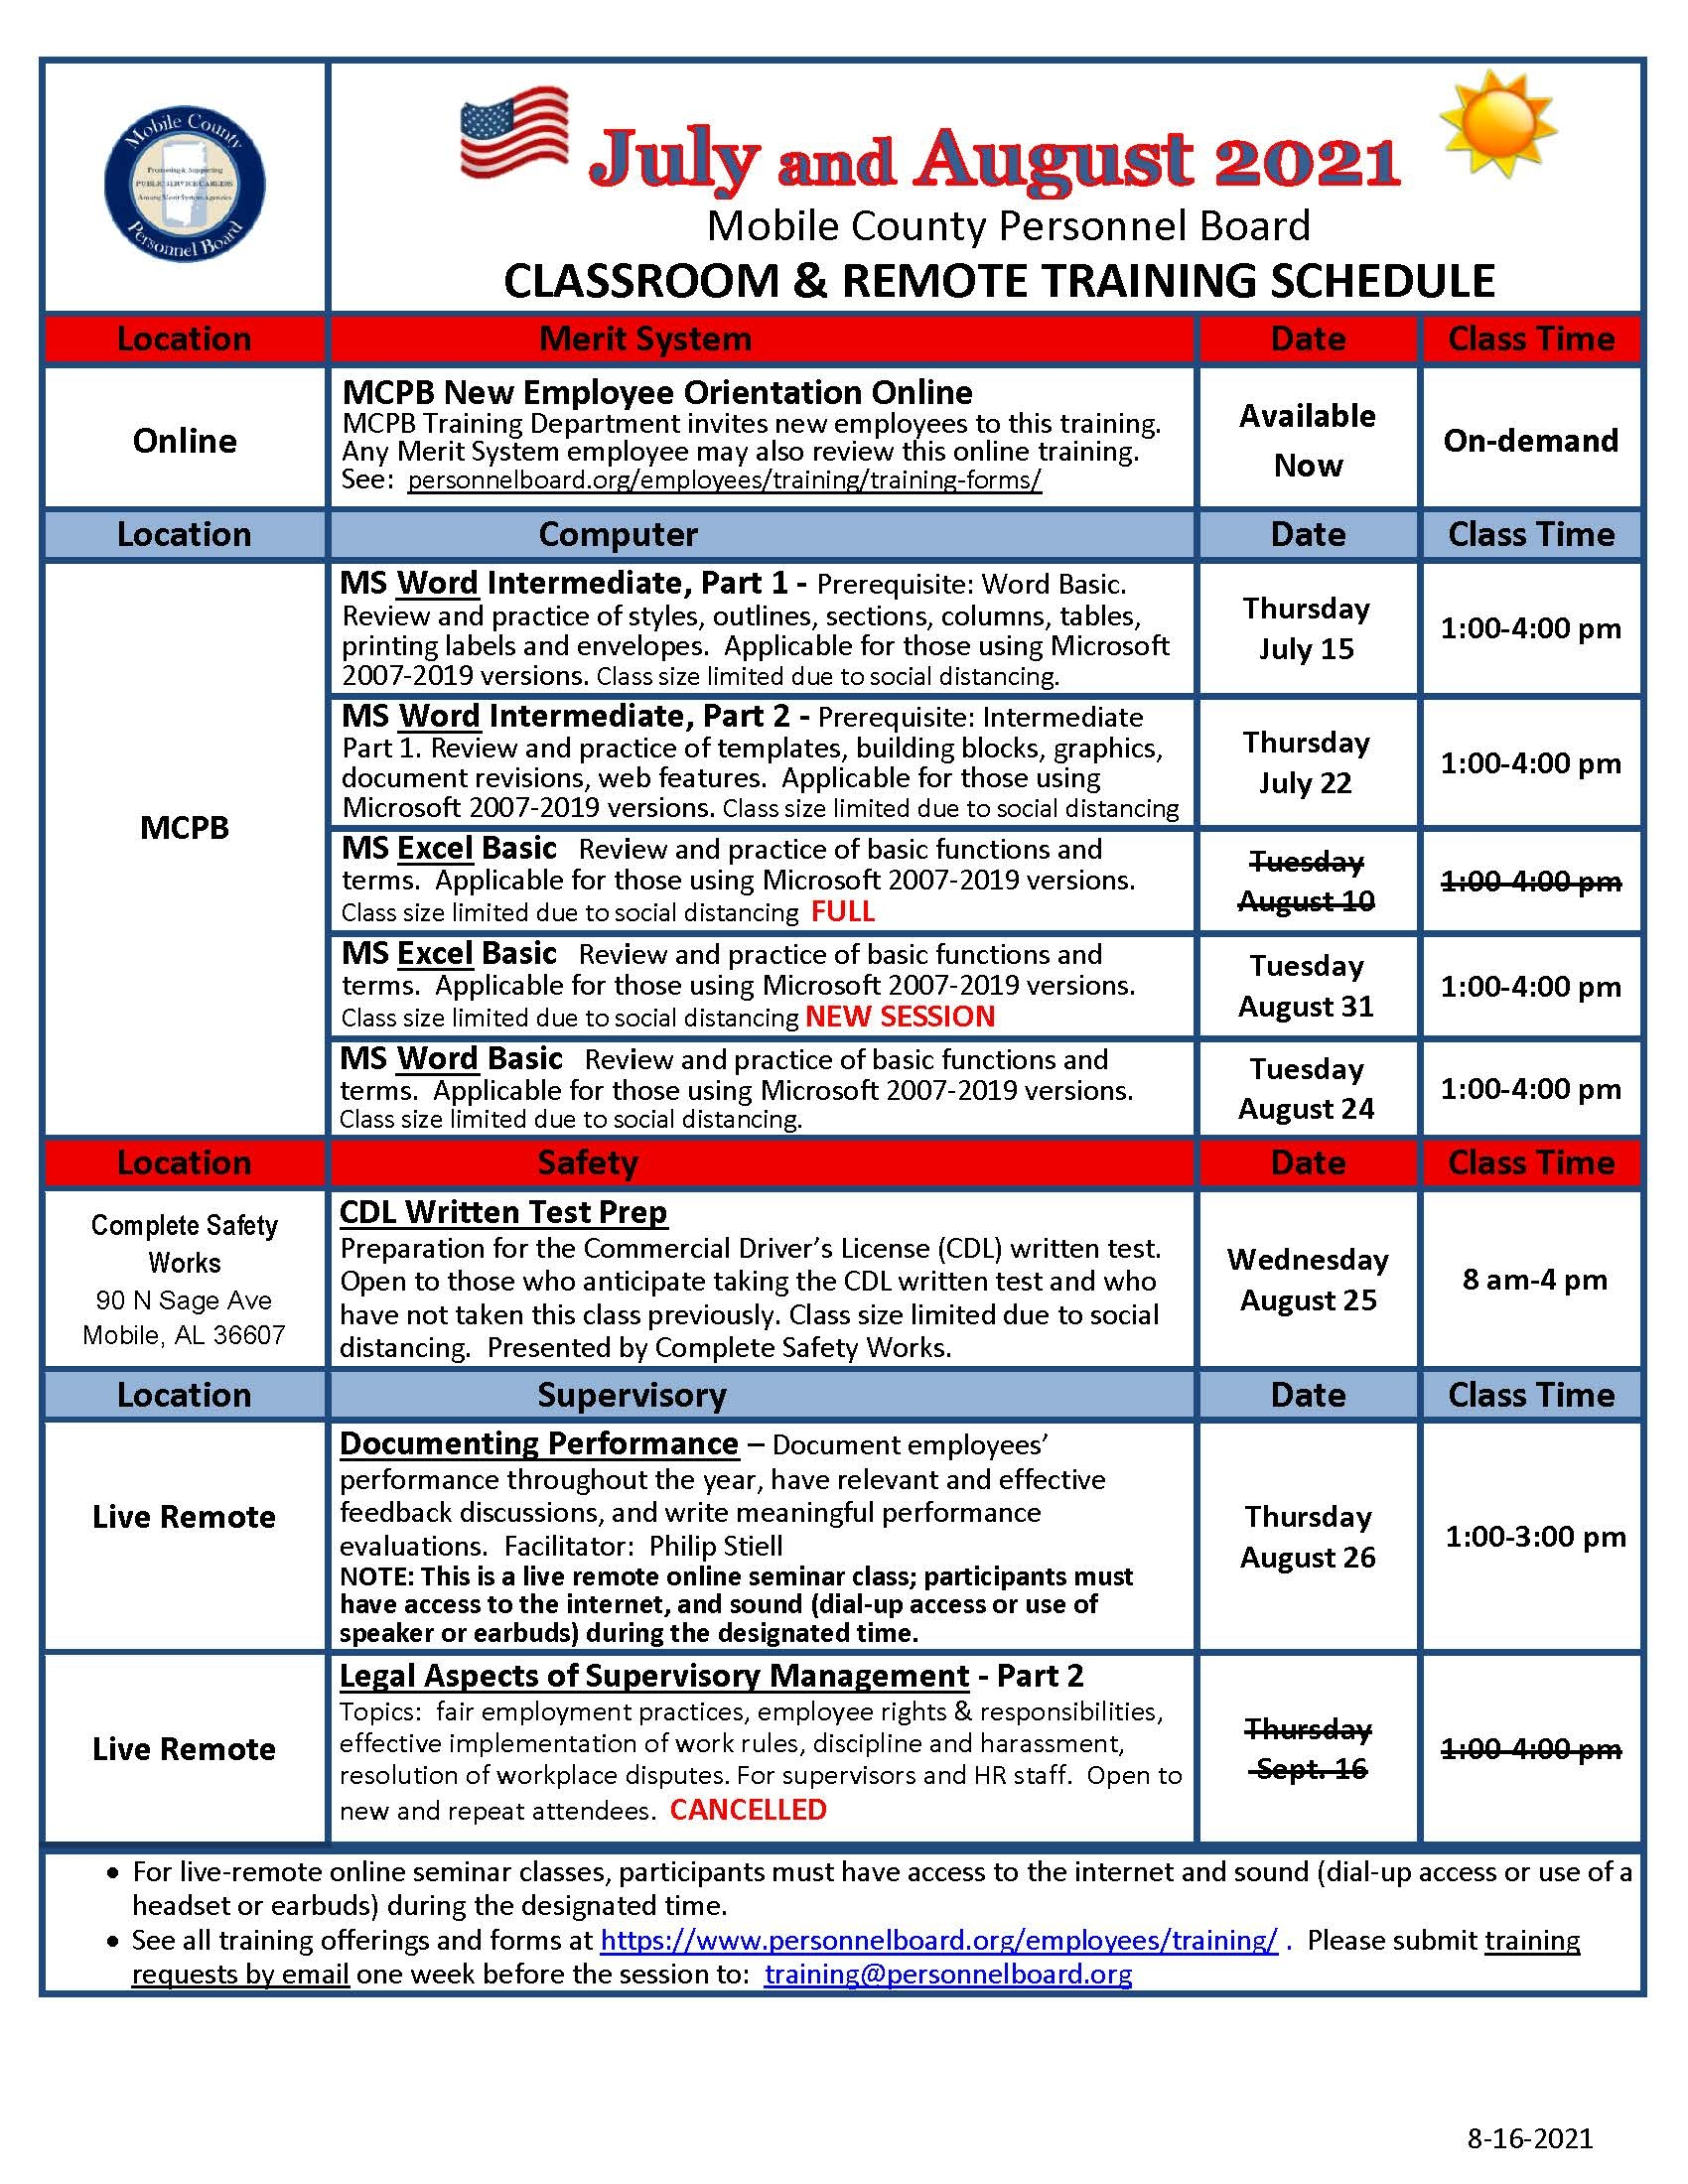 classroom training schedule icon